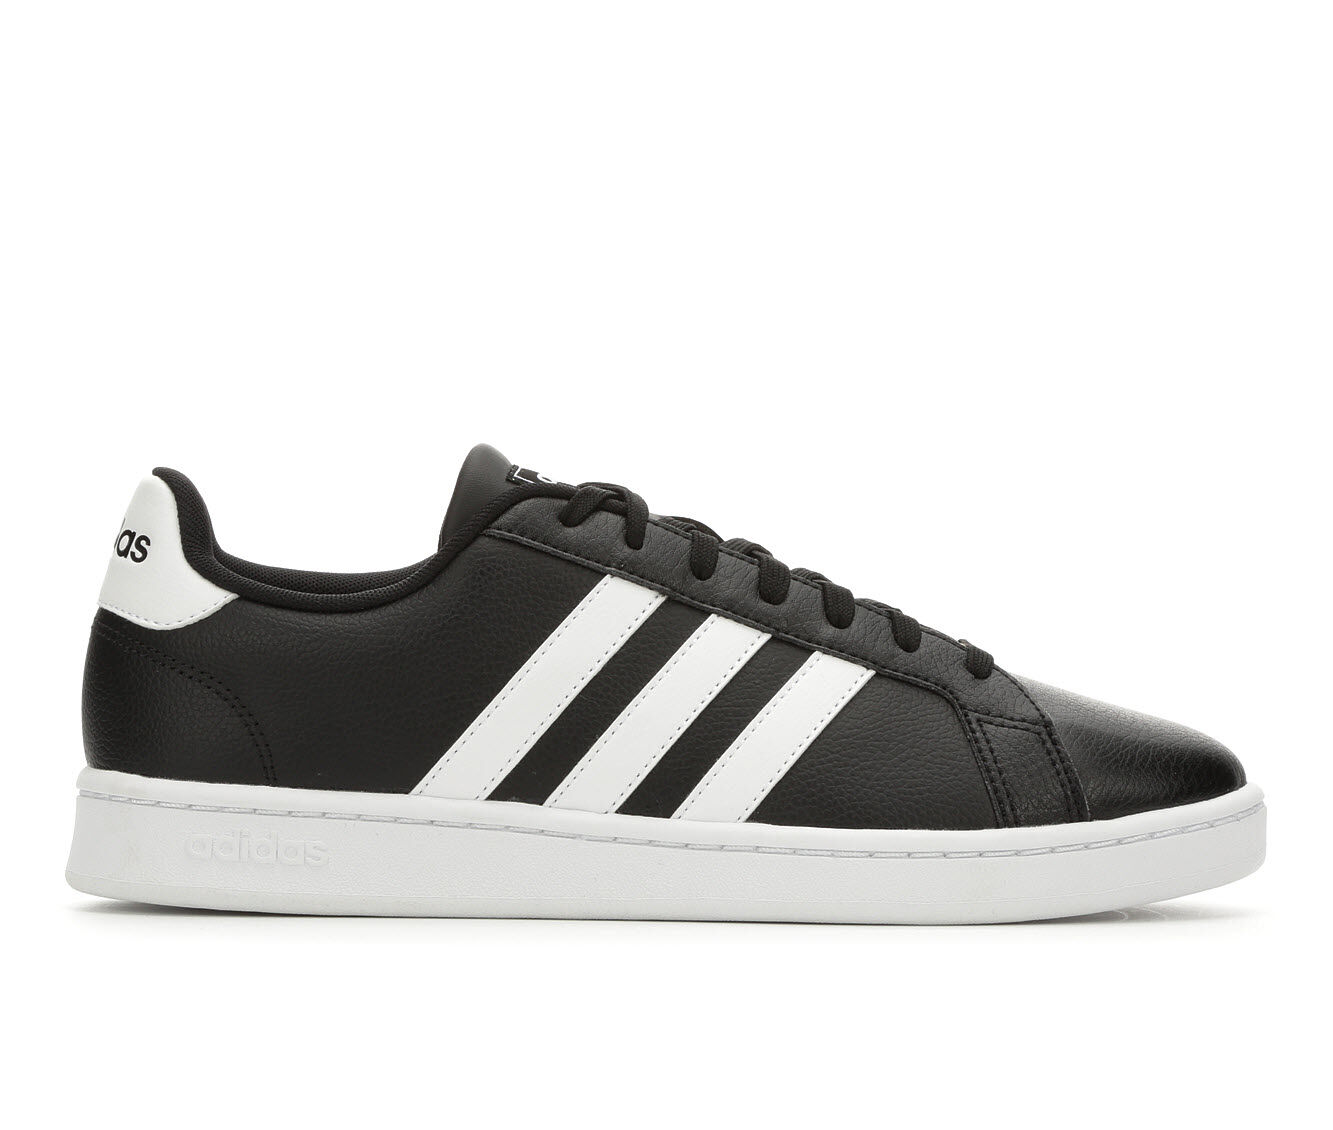 Men's Adidas Grand Court Retro Sneakers Blk/Wht